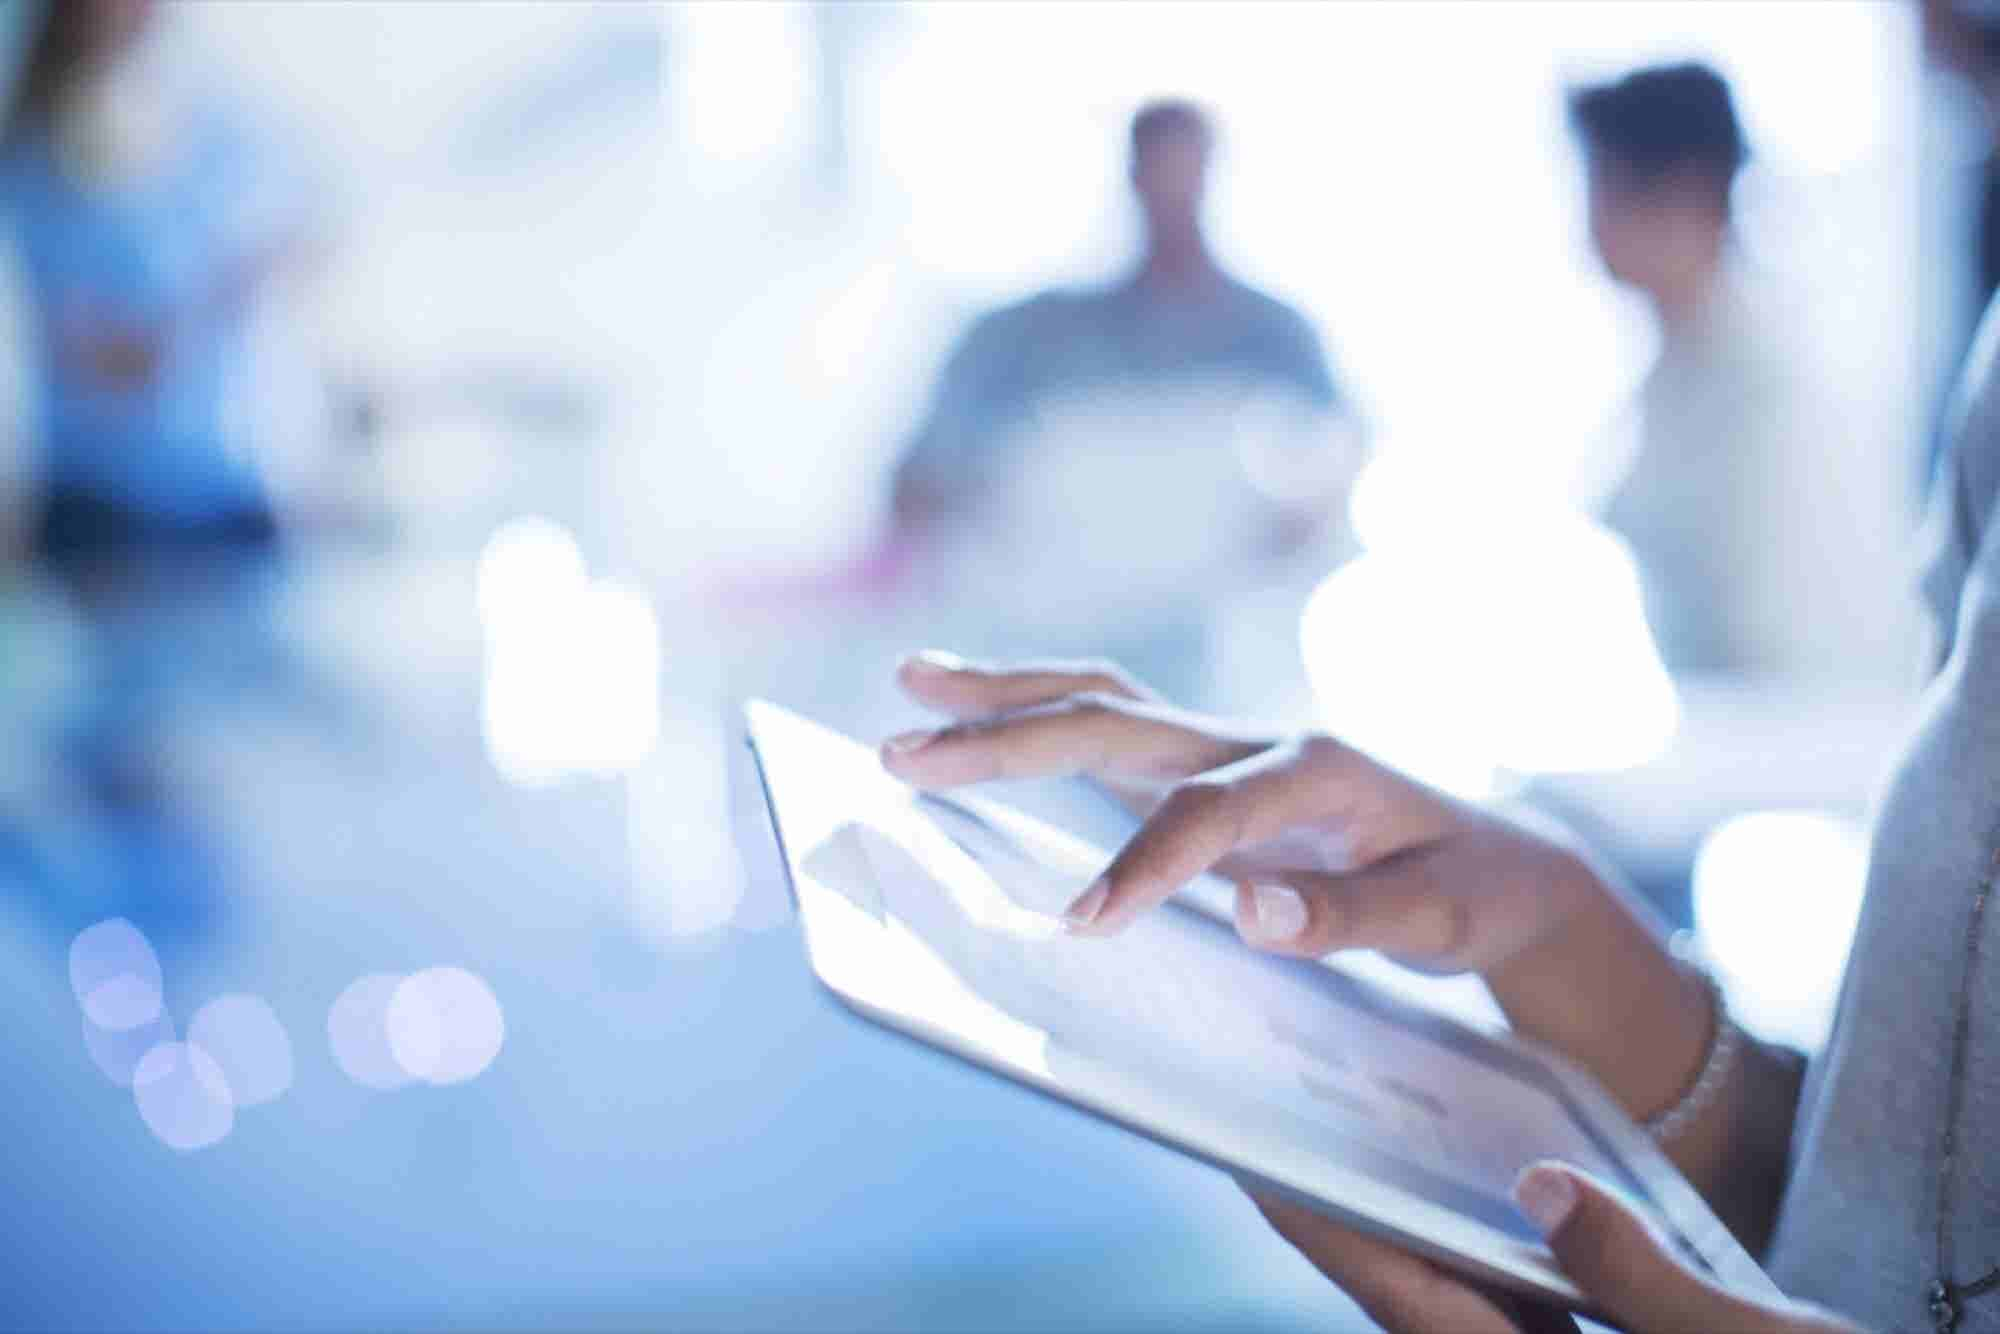 15 'RegTech' Investors Every Fintech Startup Needs to Know